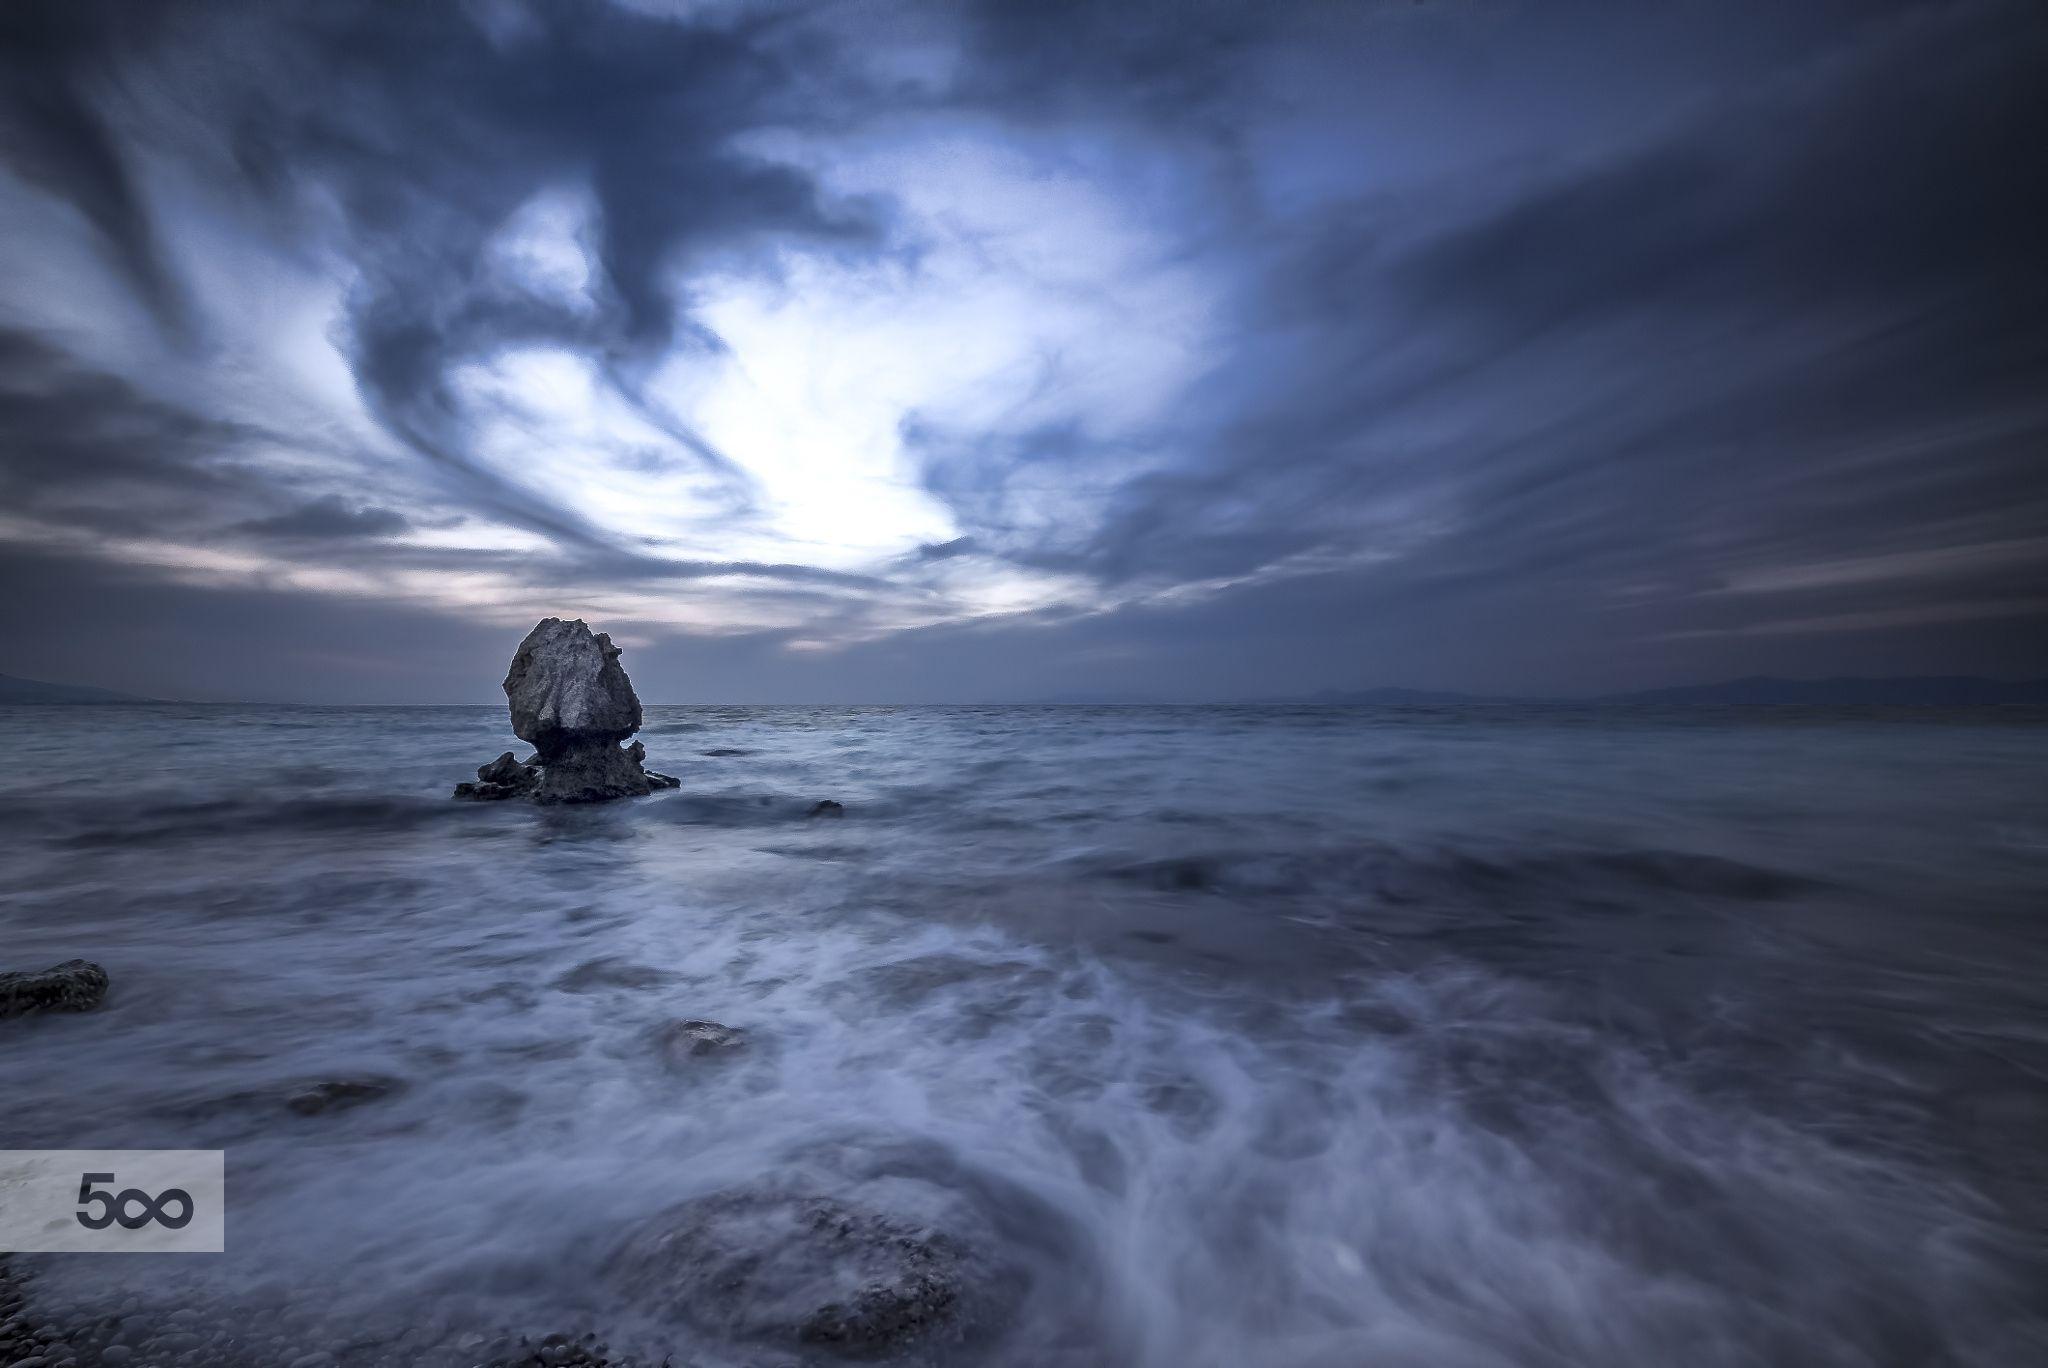 Photo The Rock by panagiotis laoudikos on 500px